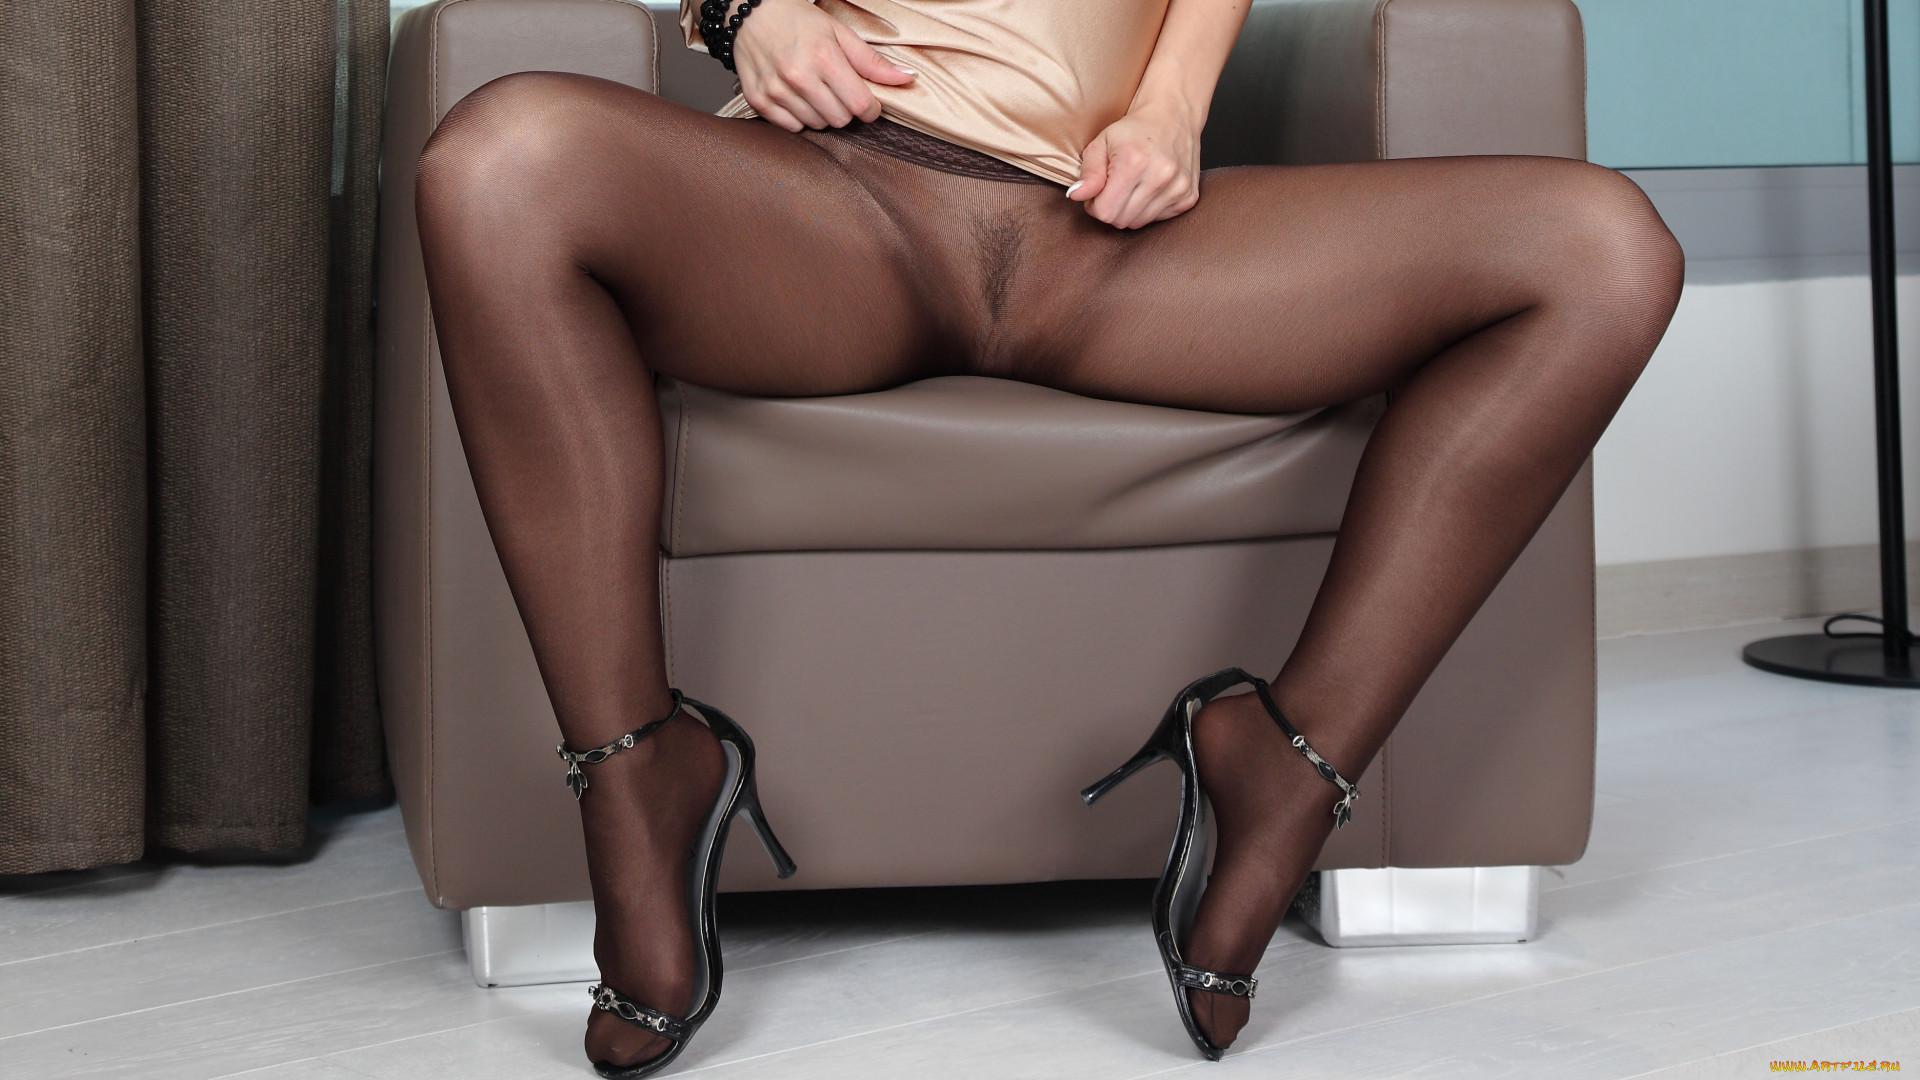 Порно фото колготки hd